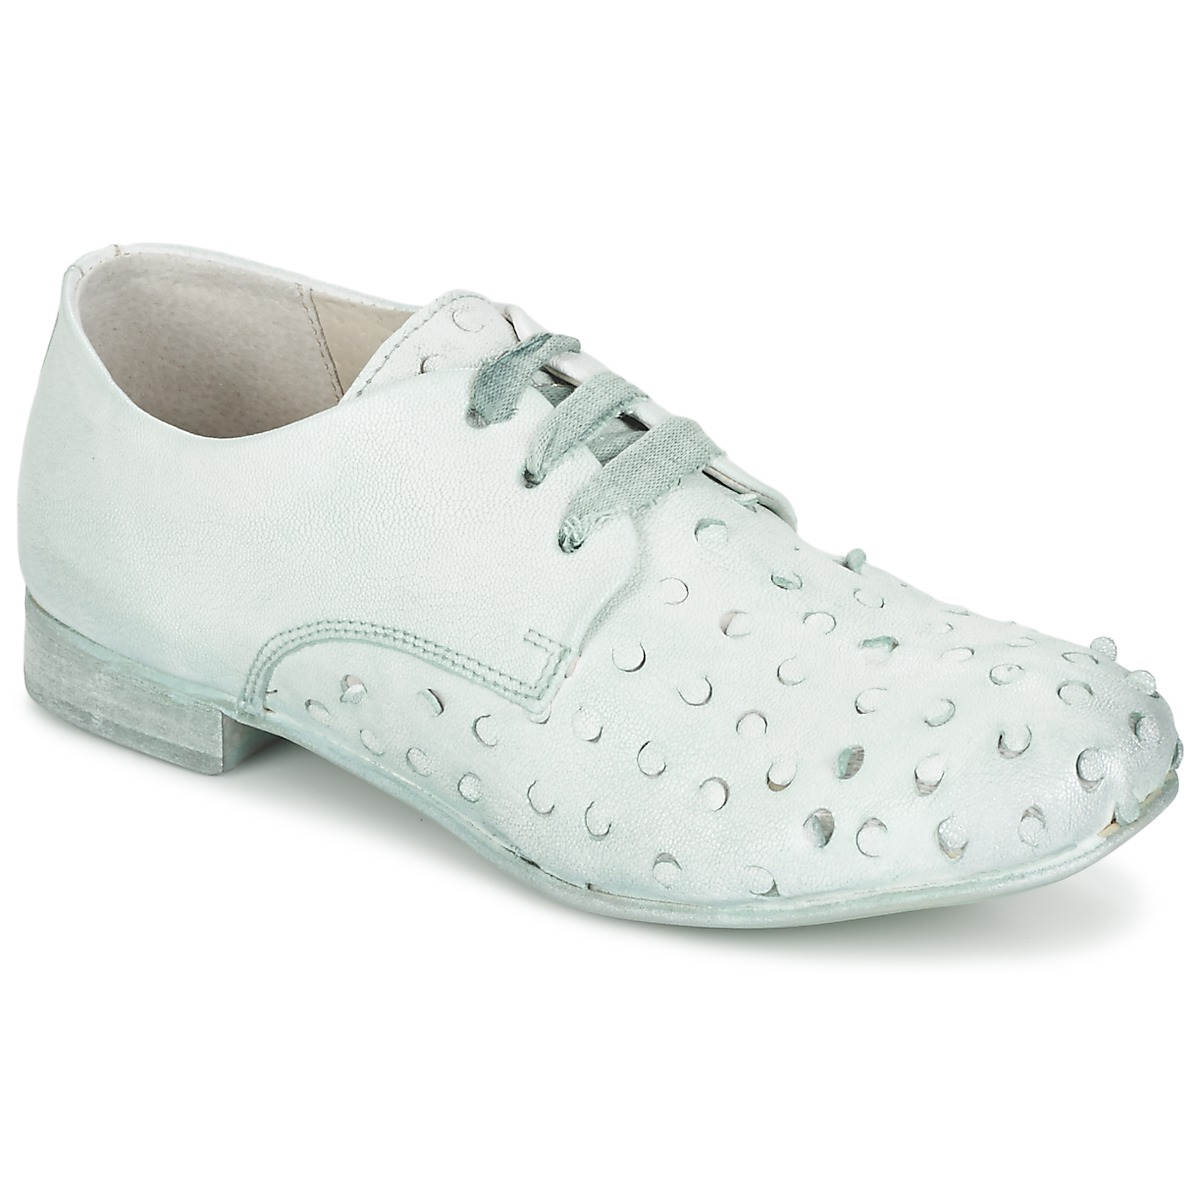 Papucei CALIA Grau - Kostenloser Versand bei Spartoode ! - Schuhe Derby-Schuhe Damen 83,40 €